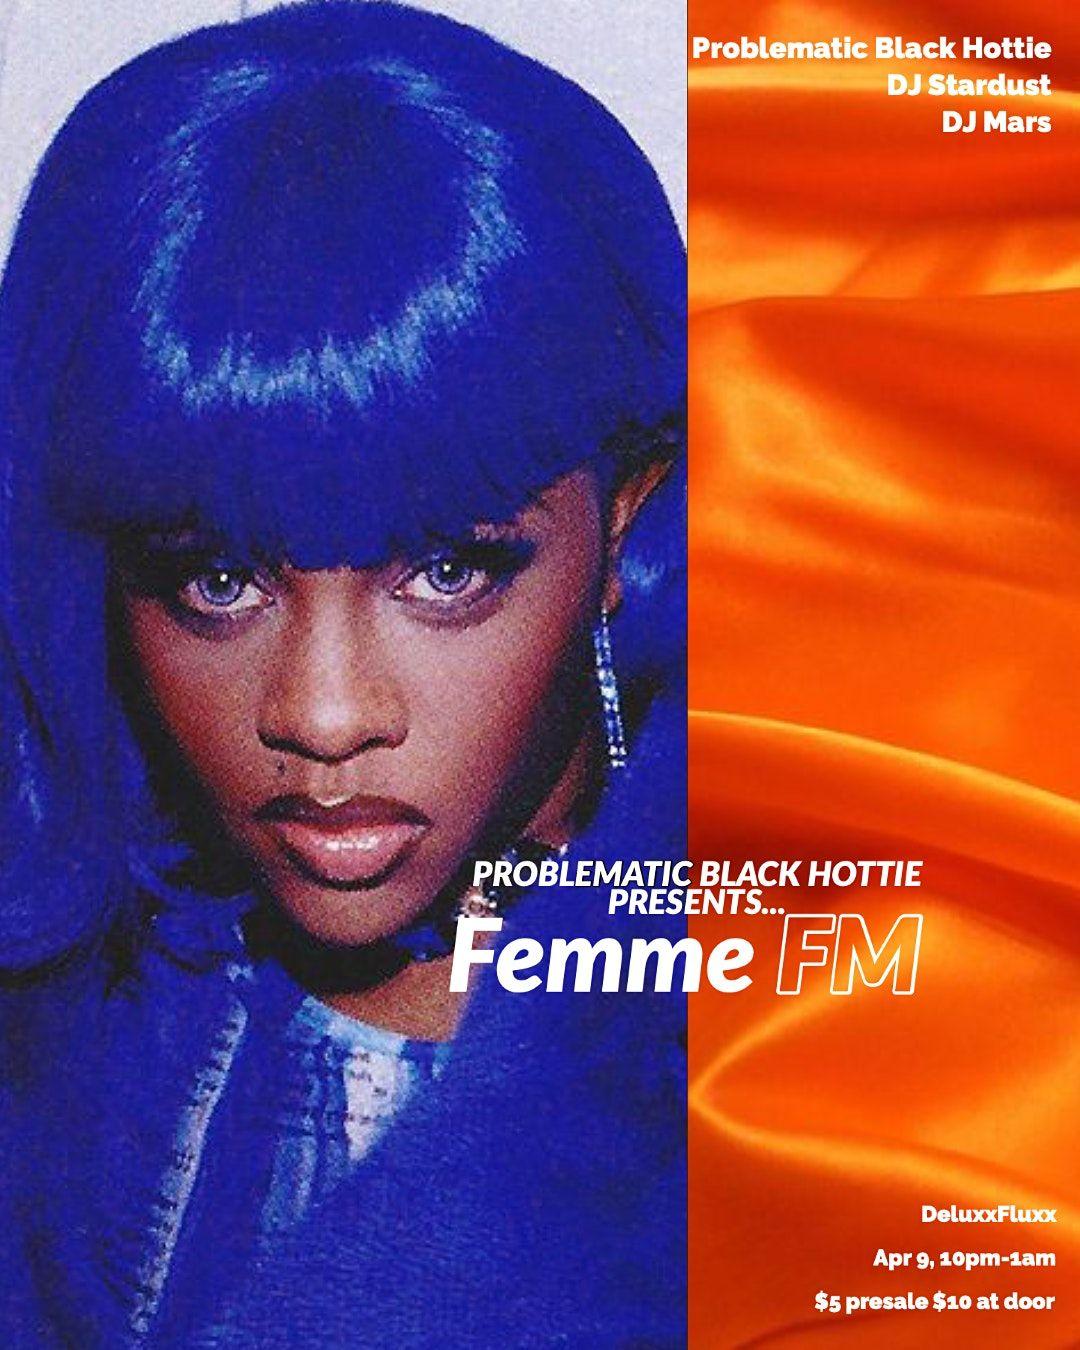 Problematic Black Hottie Presents...Femme FM